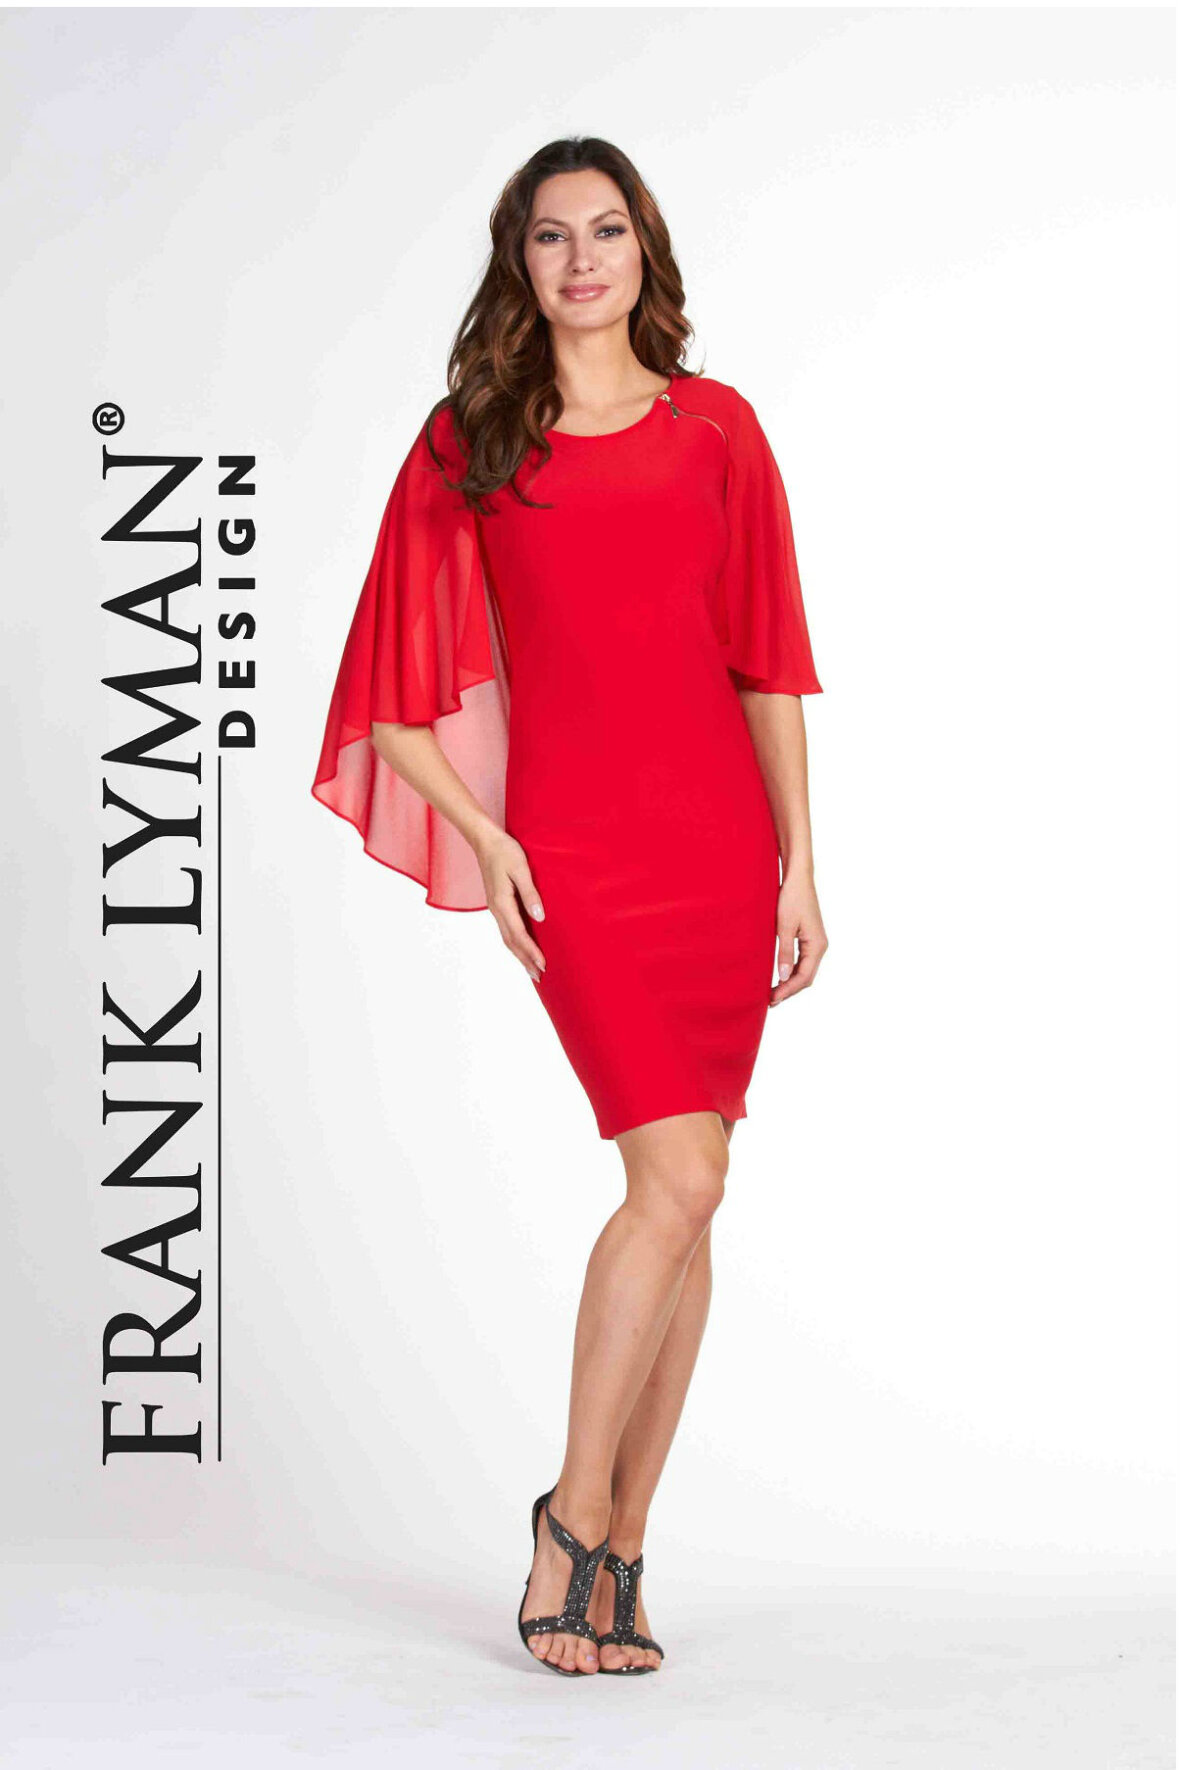 5d65752e Frank Lyman Red Choffon Cape Dress, rød kjole - Hos Lohse